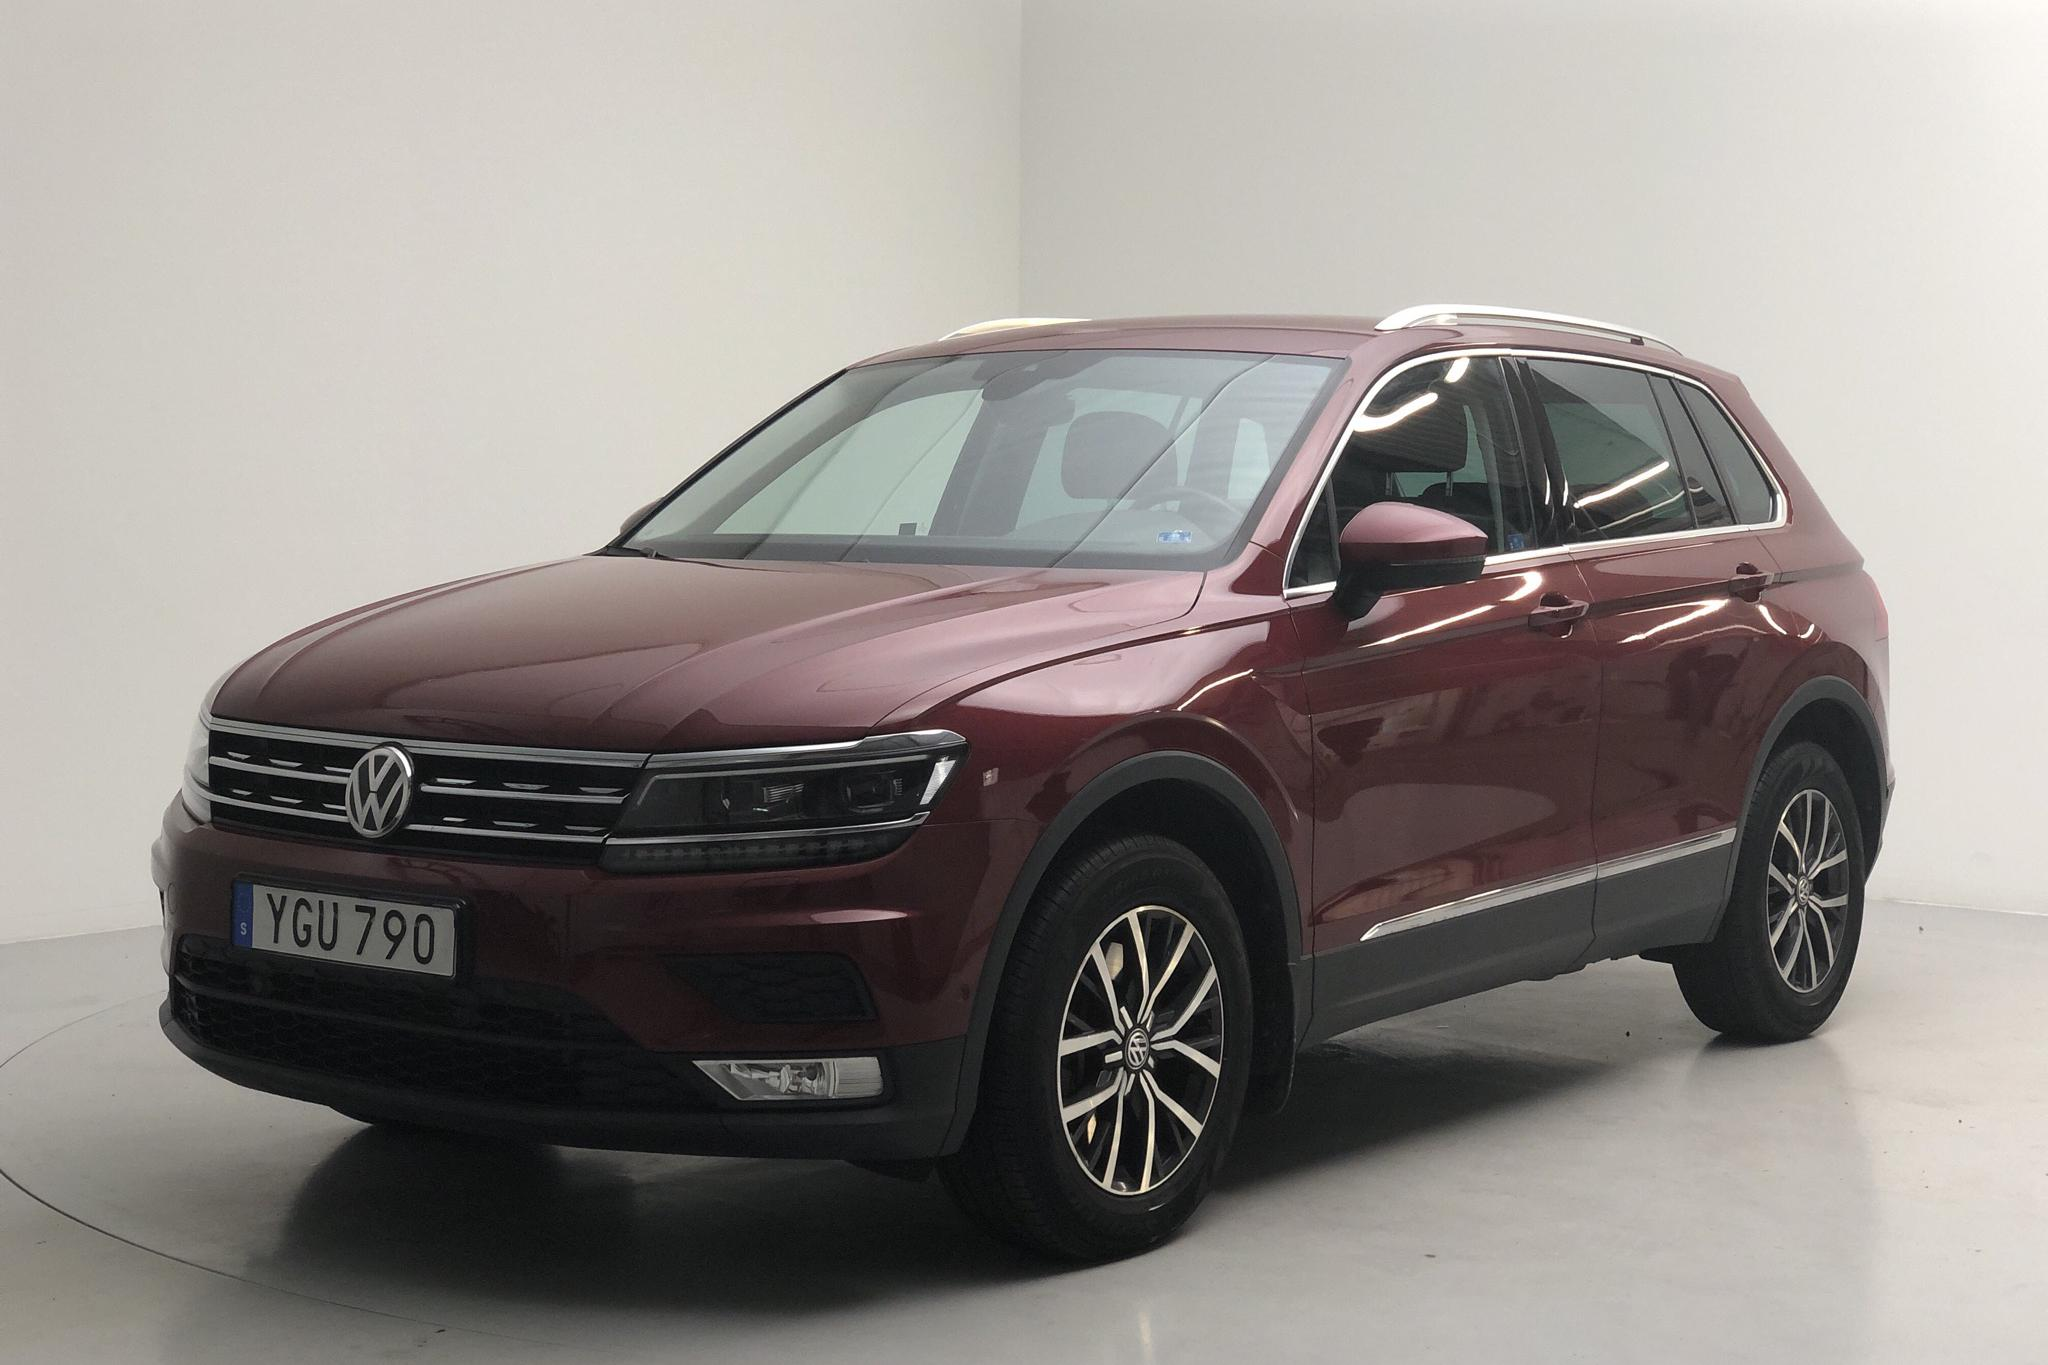 VW Tiguan 2.0 TSI 4MOTION (180hk) - 4 694 mil - Automat - Dark Red - 2017